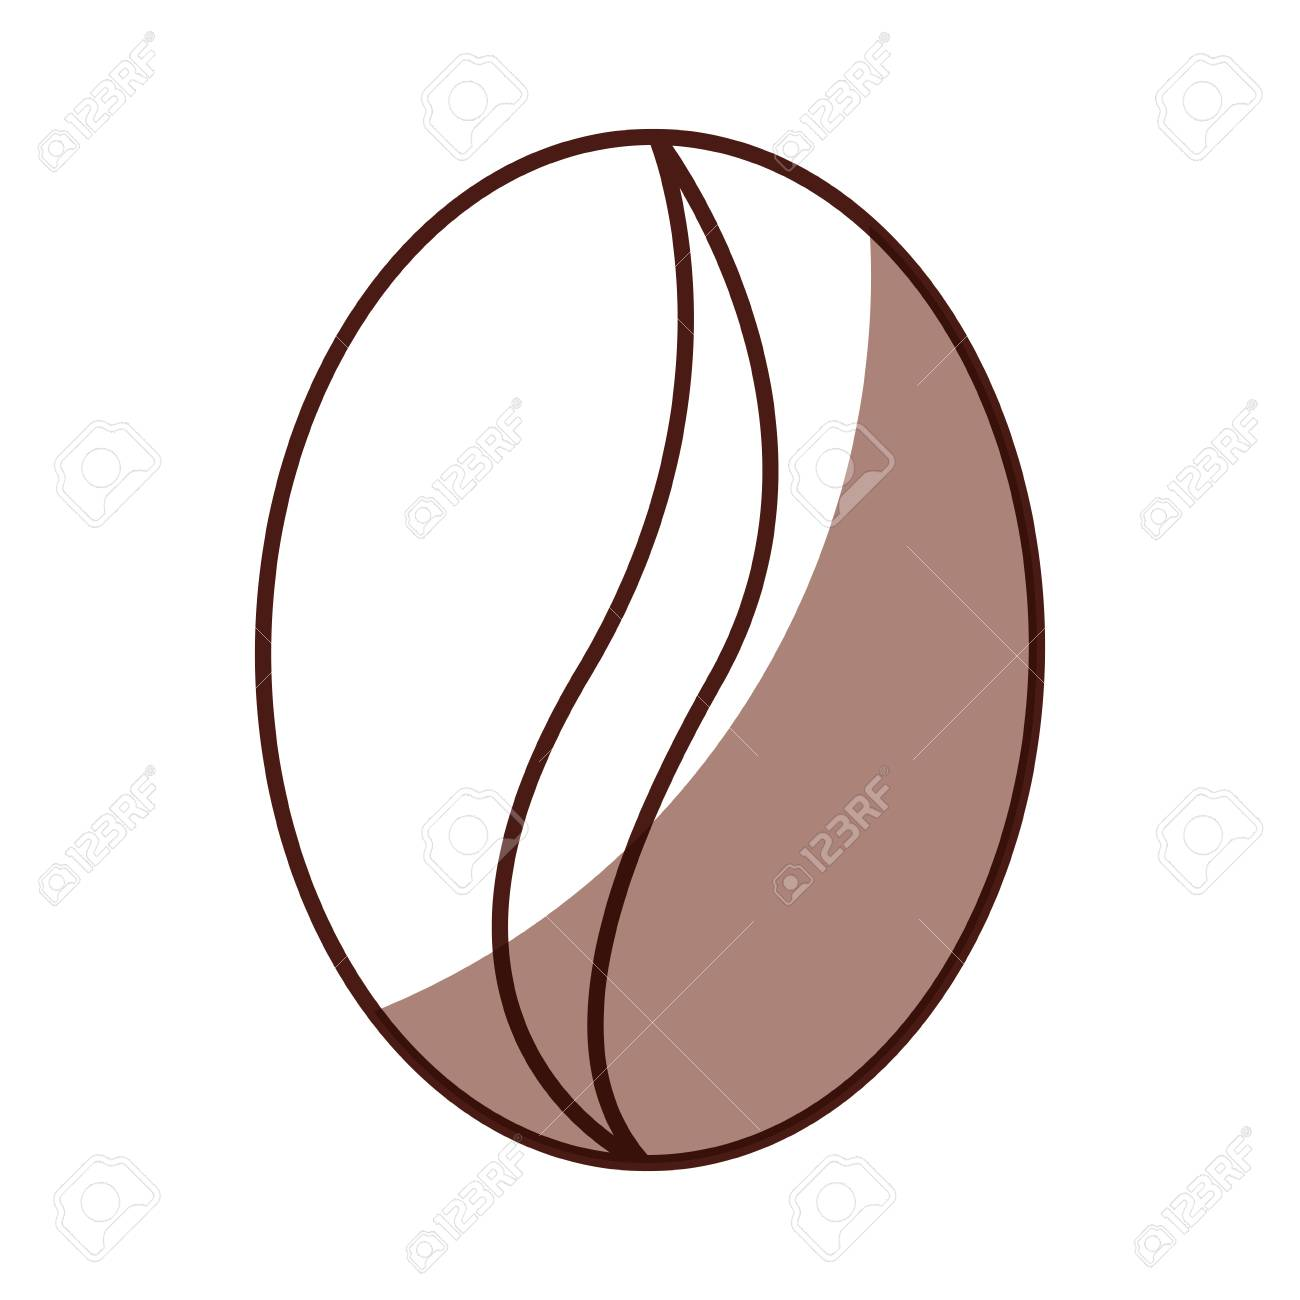 Shadow Coffee Bean Cartoon Vector Graphic Design Royalty Free